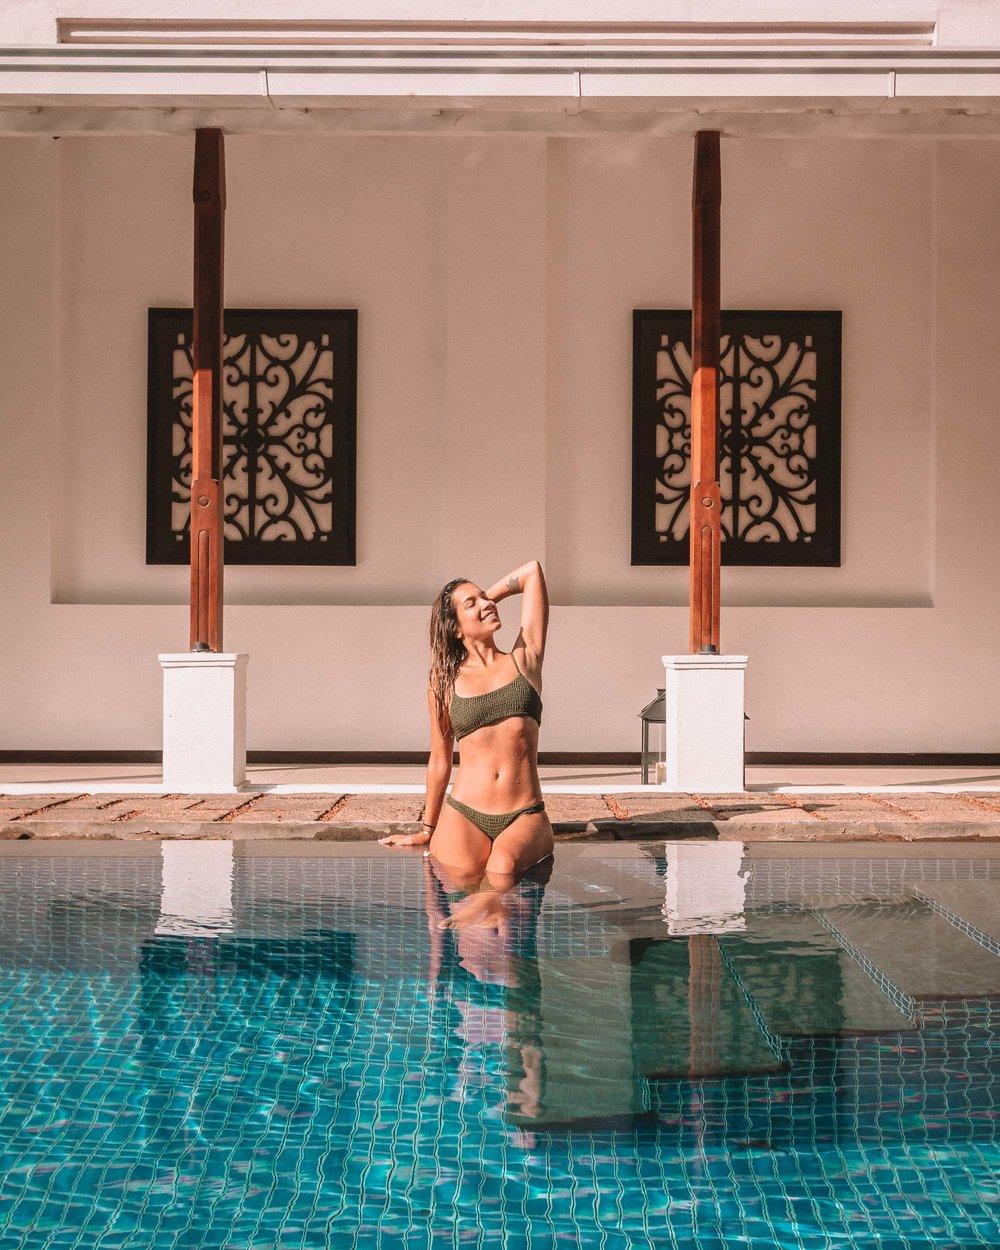 Residence by Uga Escapes swimming pool view bikini girl body goals boutique hotel Sri Lanka